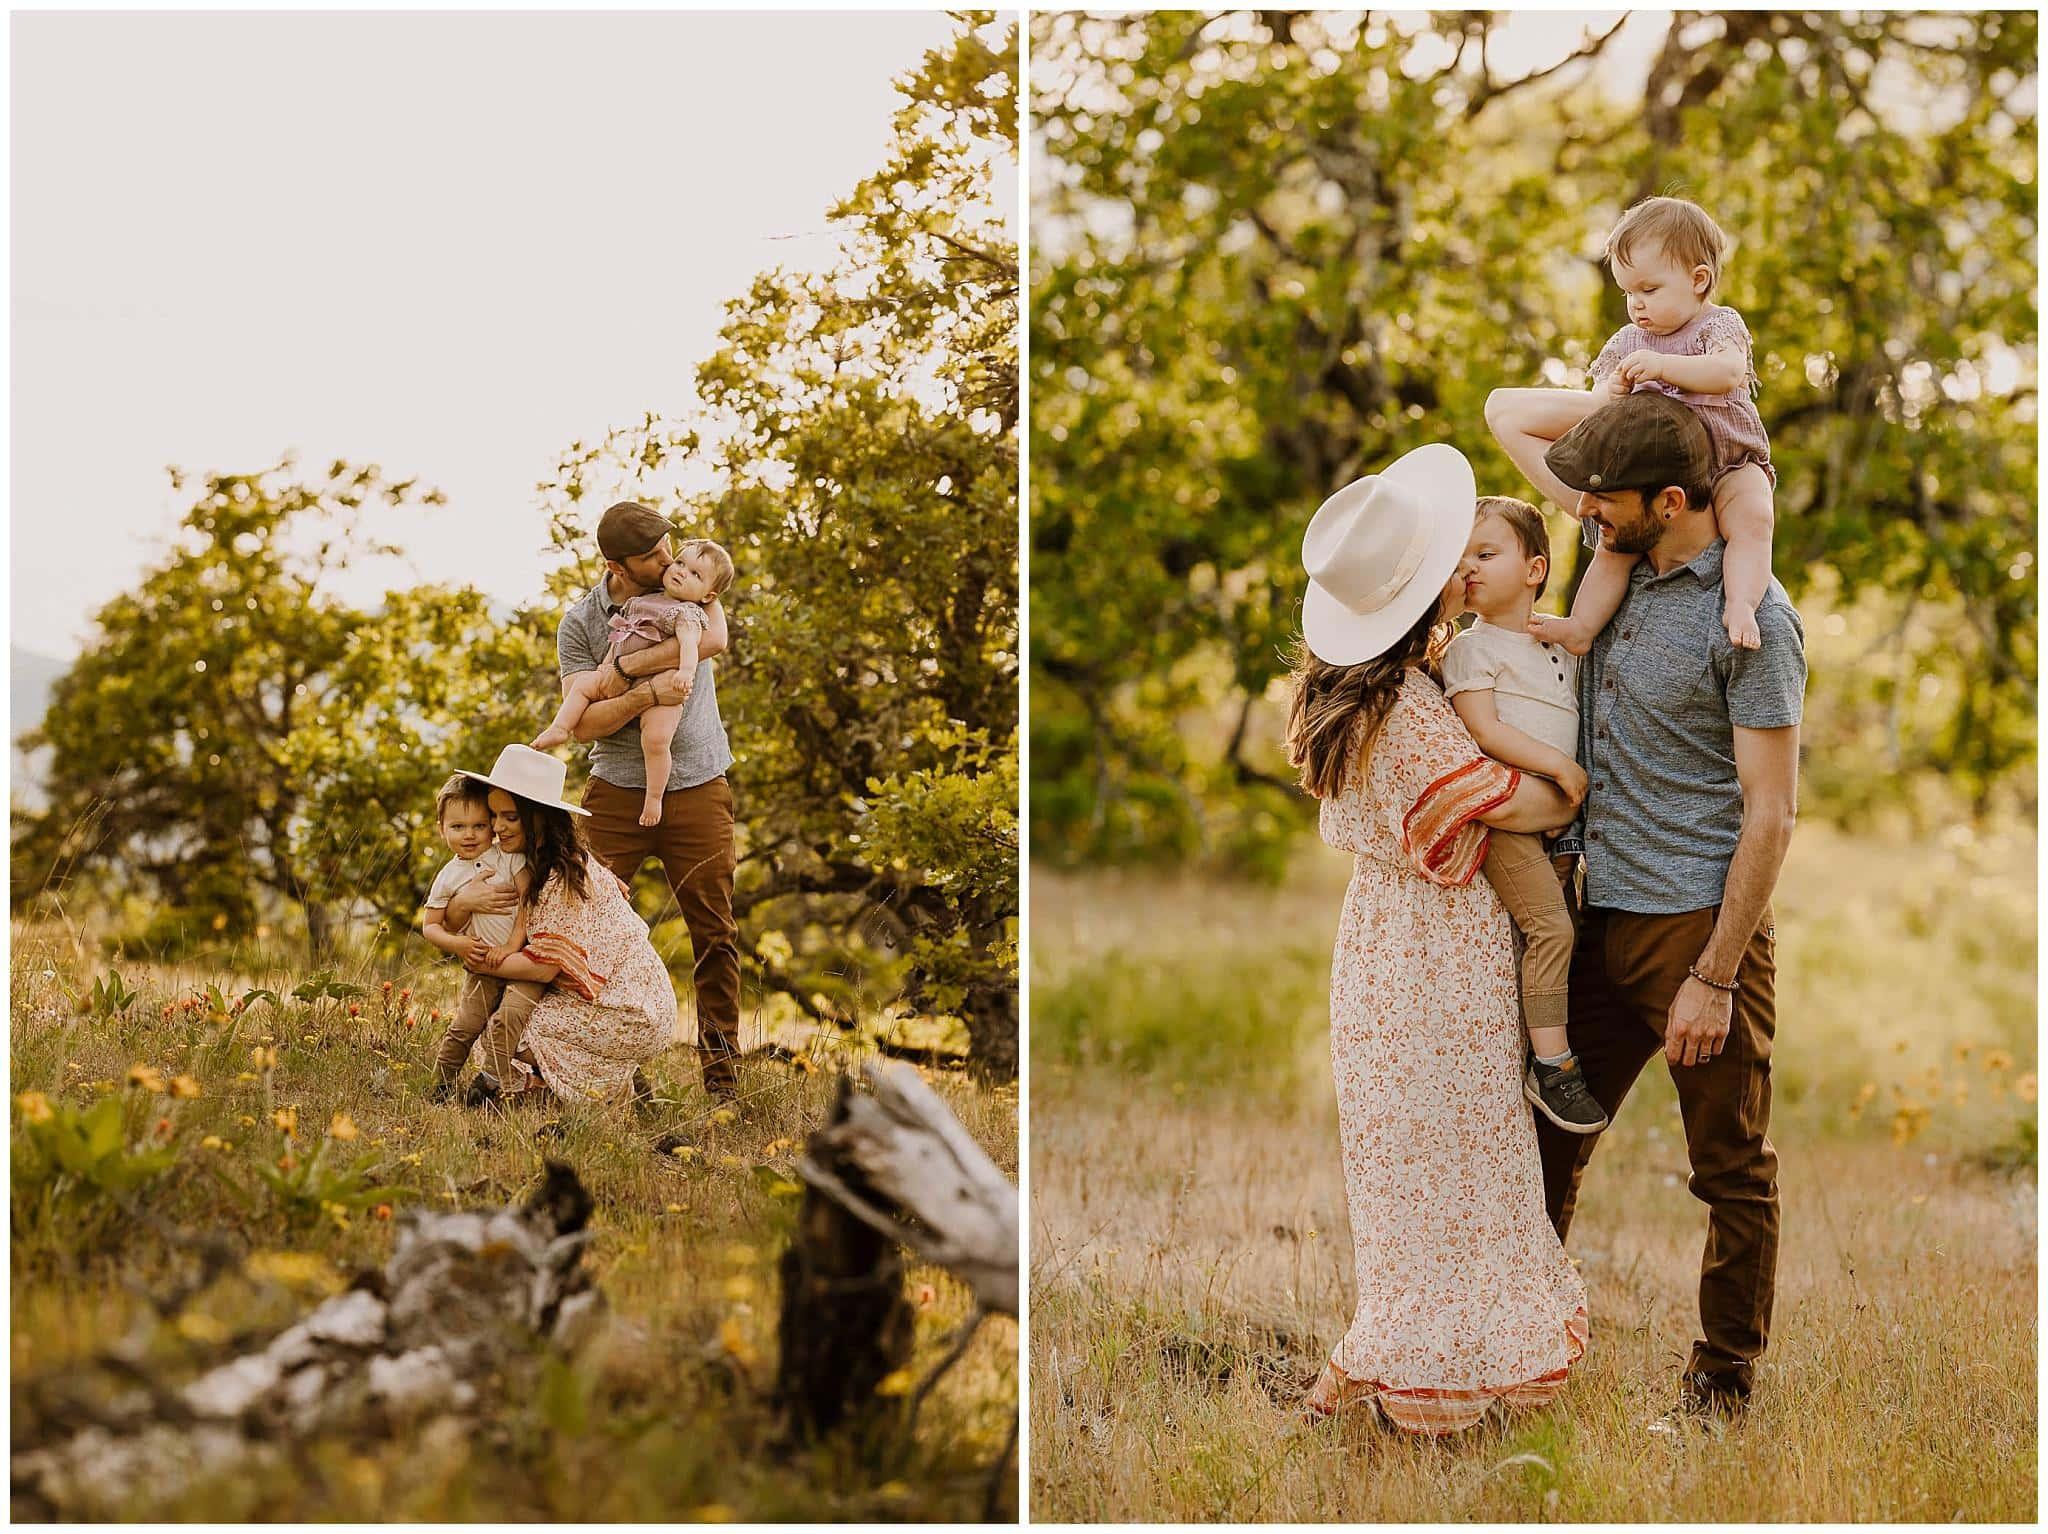 Family photos in Mosier, Oregon during wildflower season